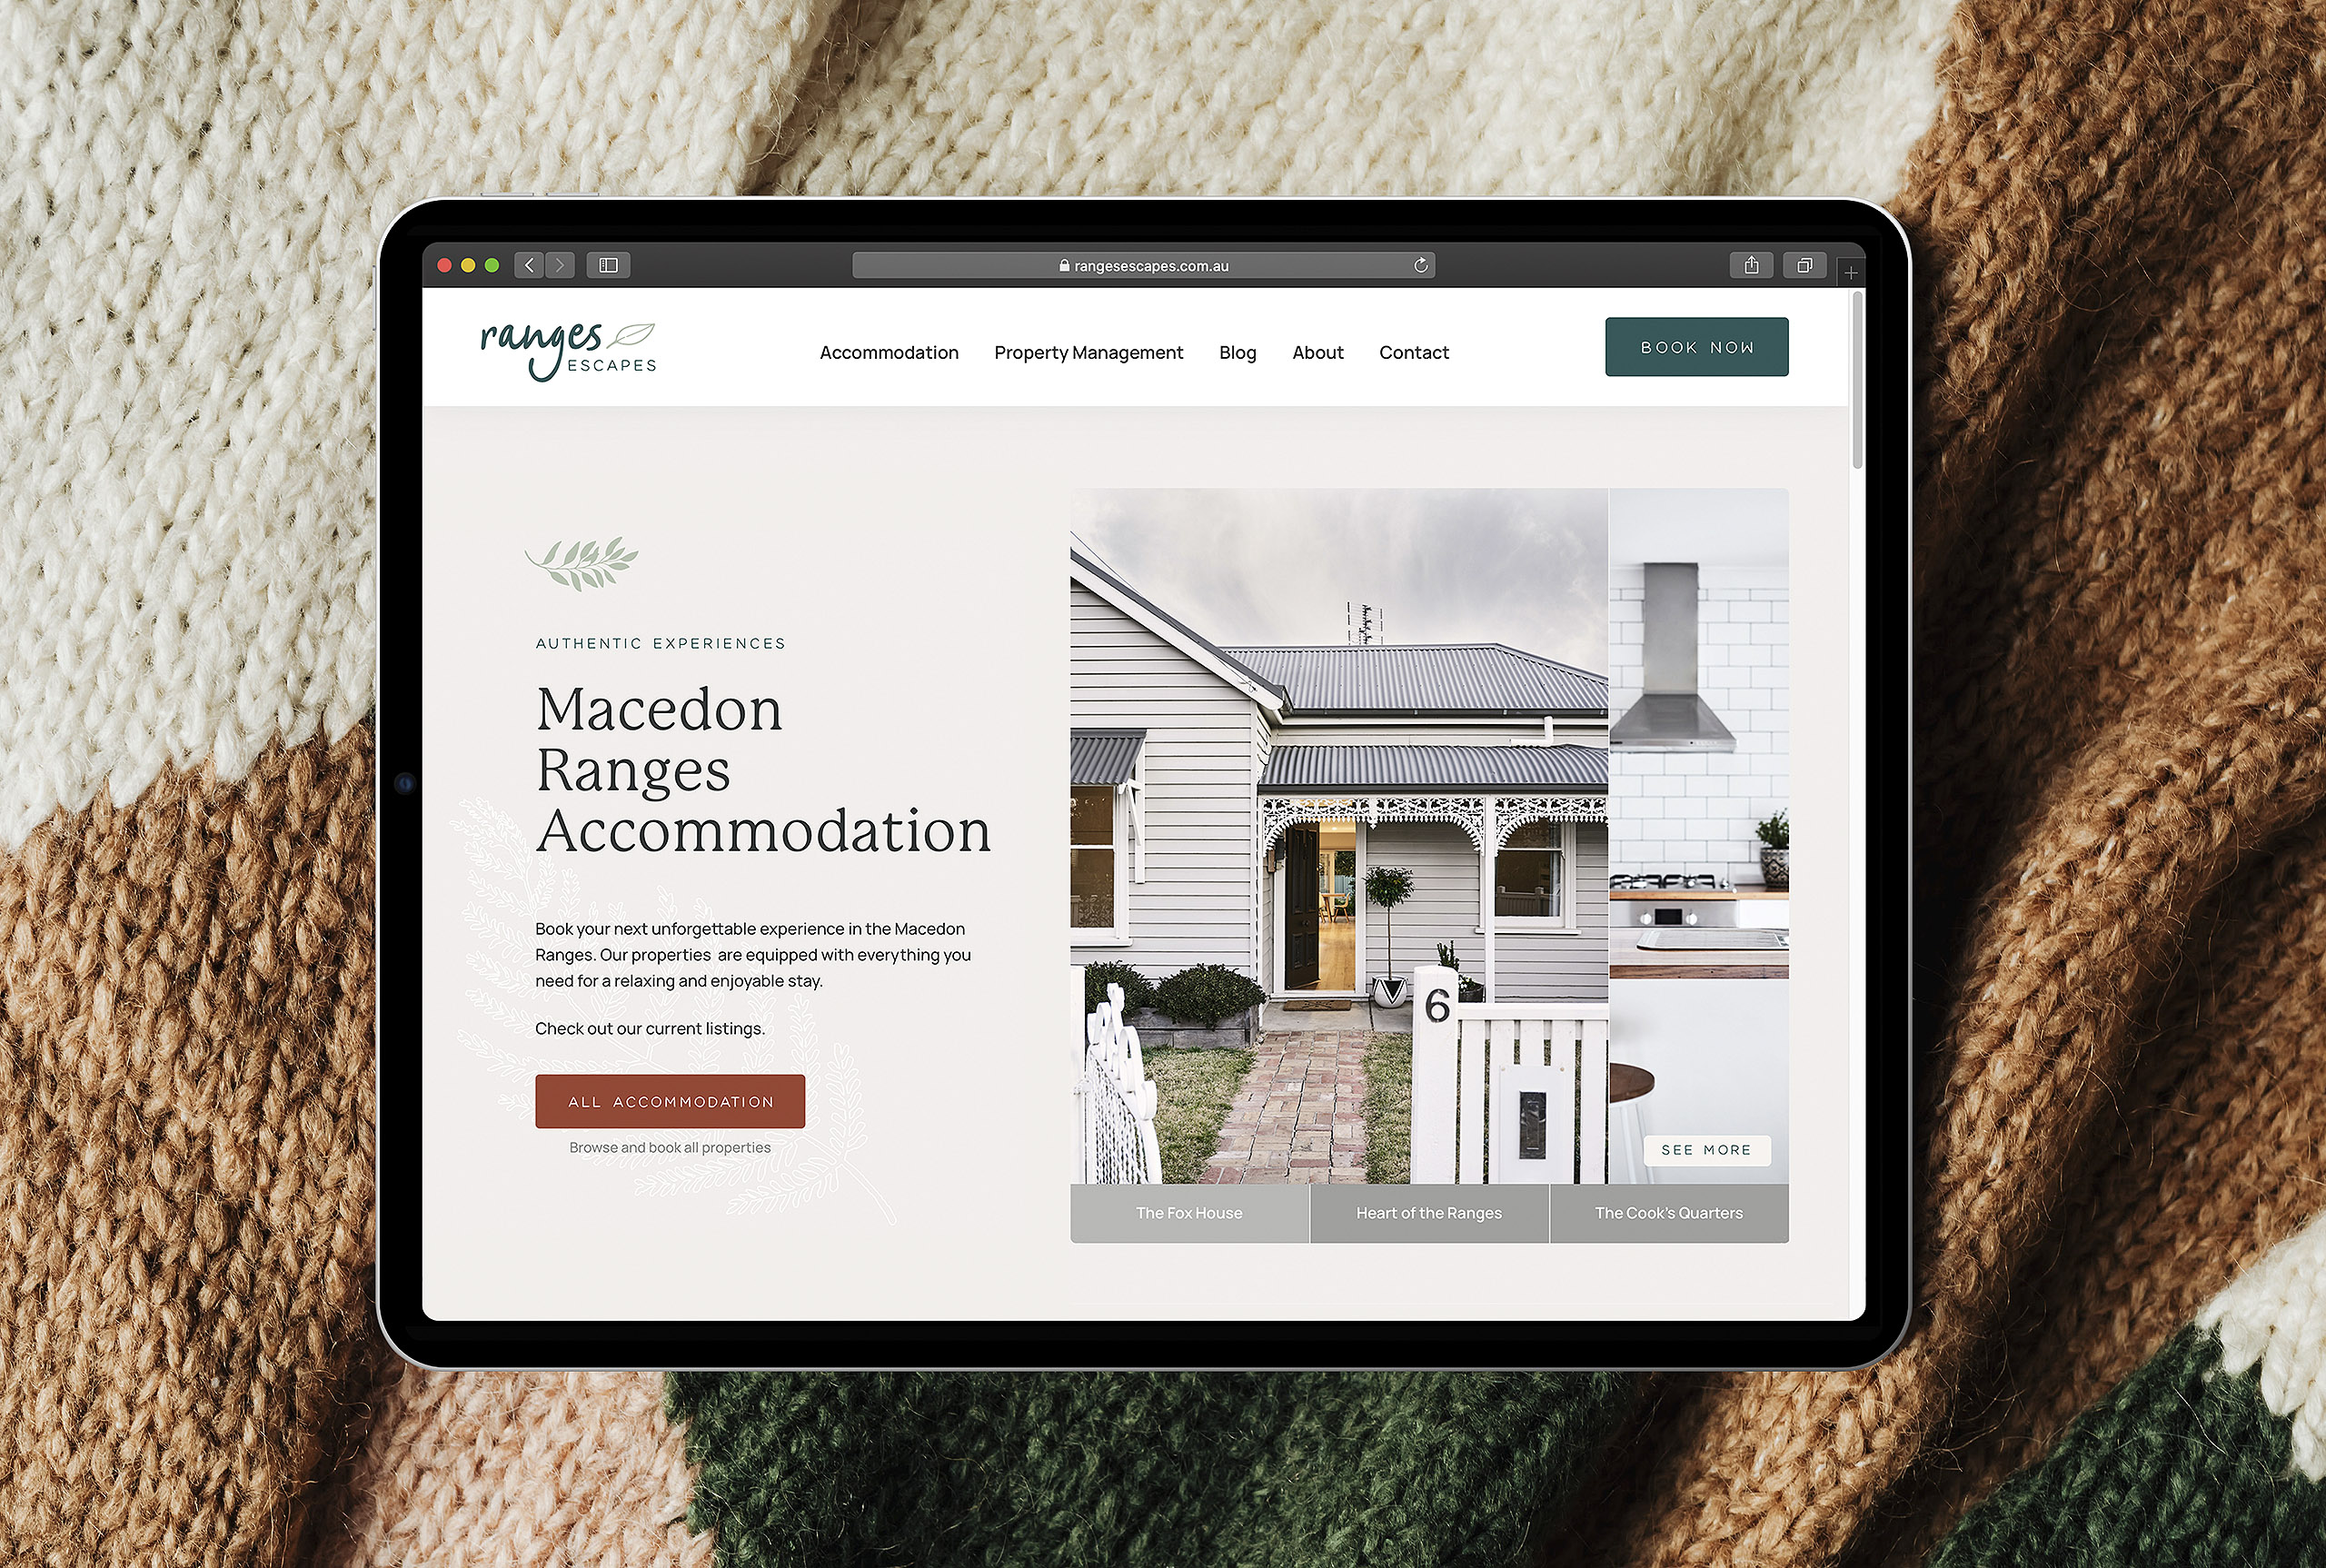 Ranges Escapes website design and Lodgify booking platform